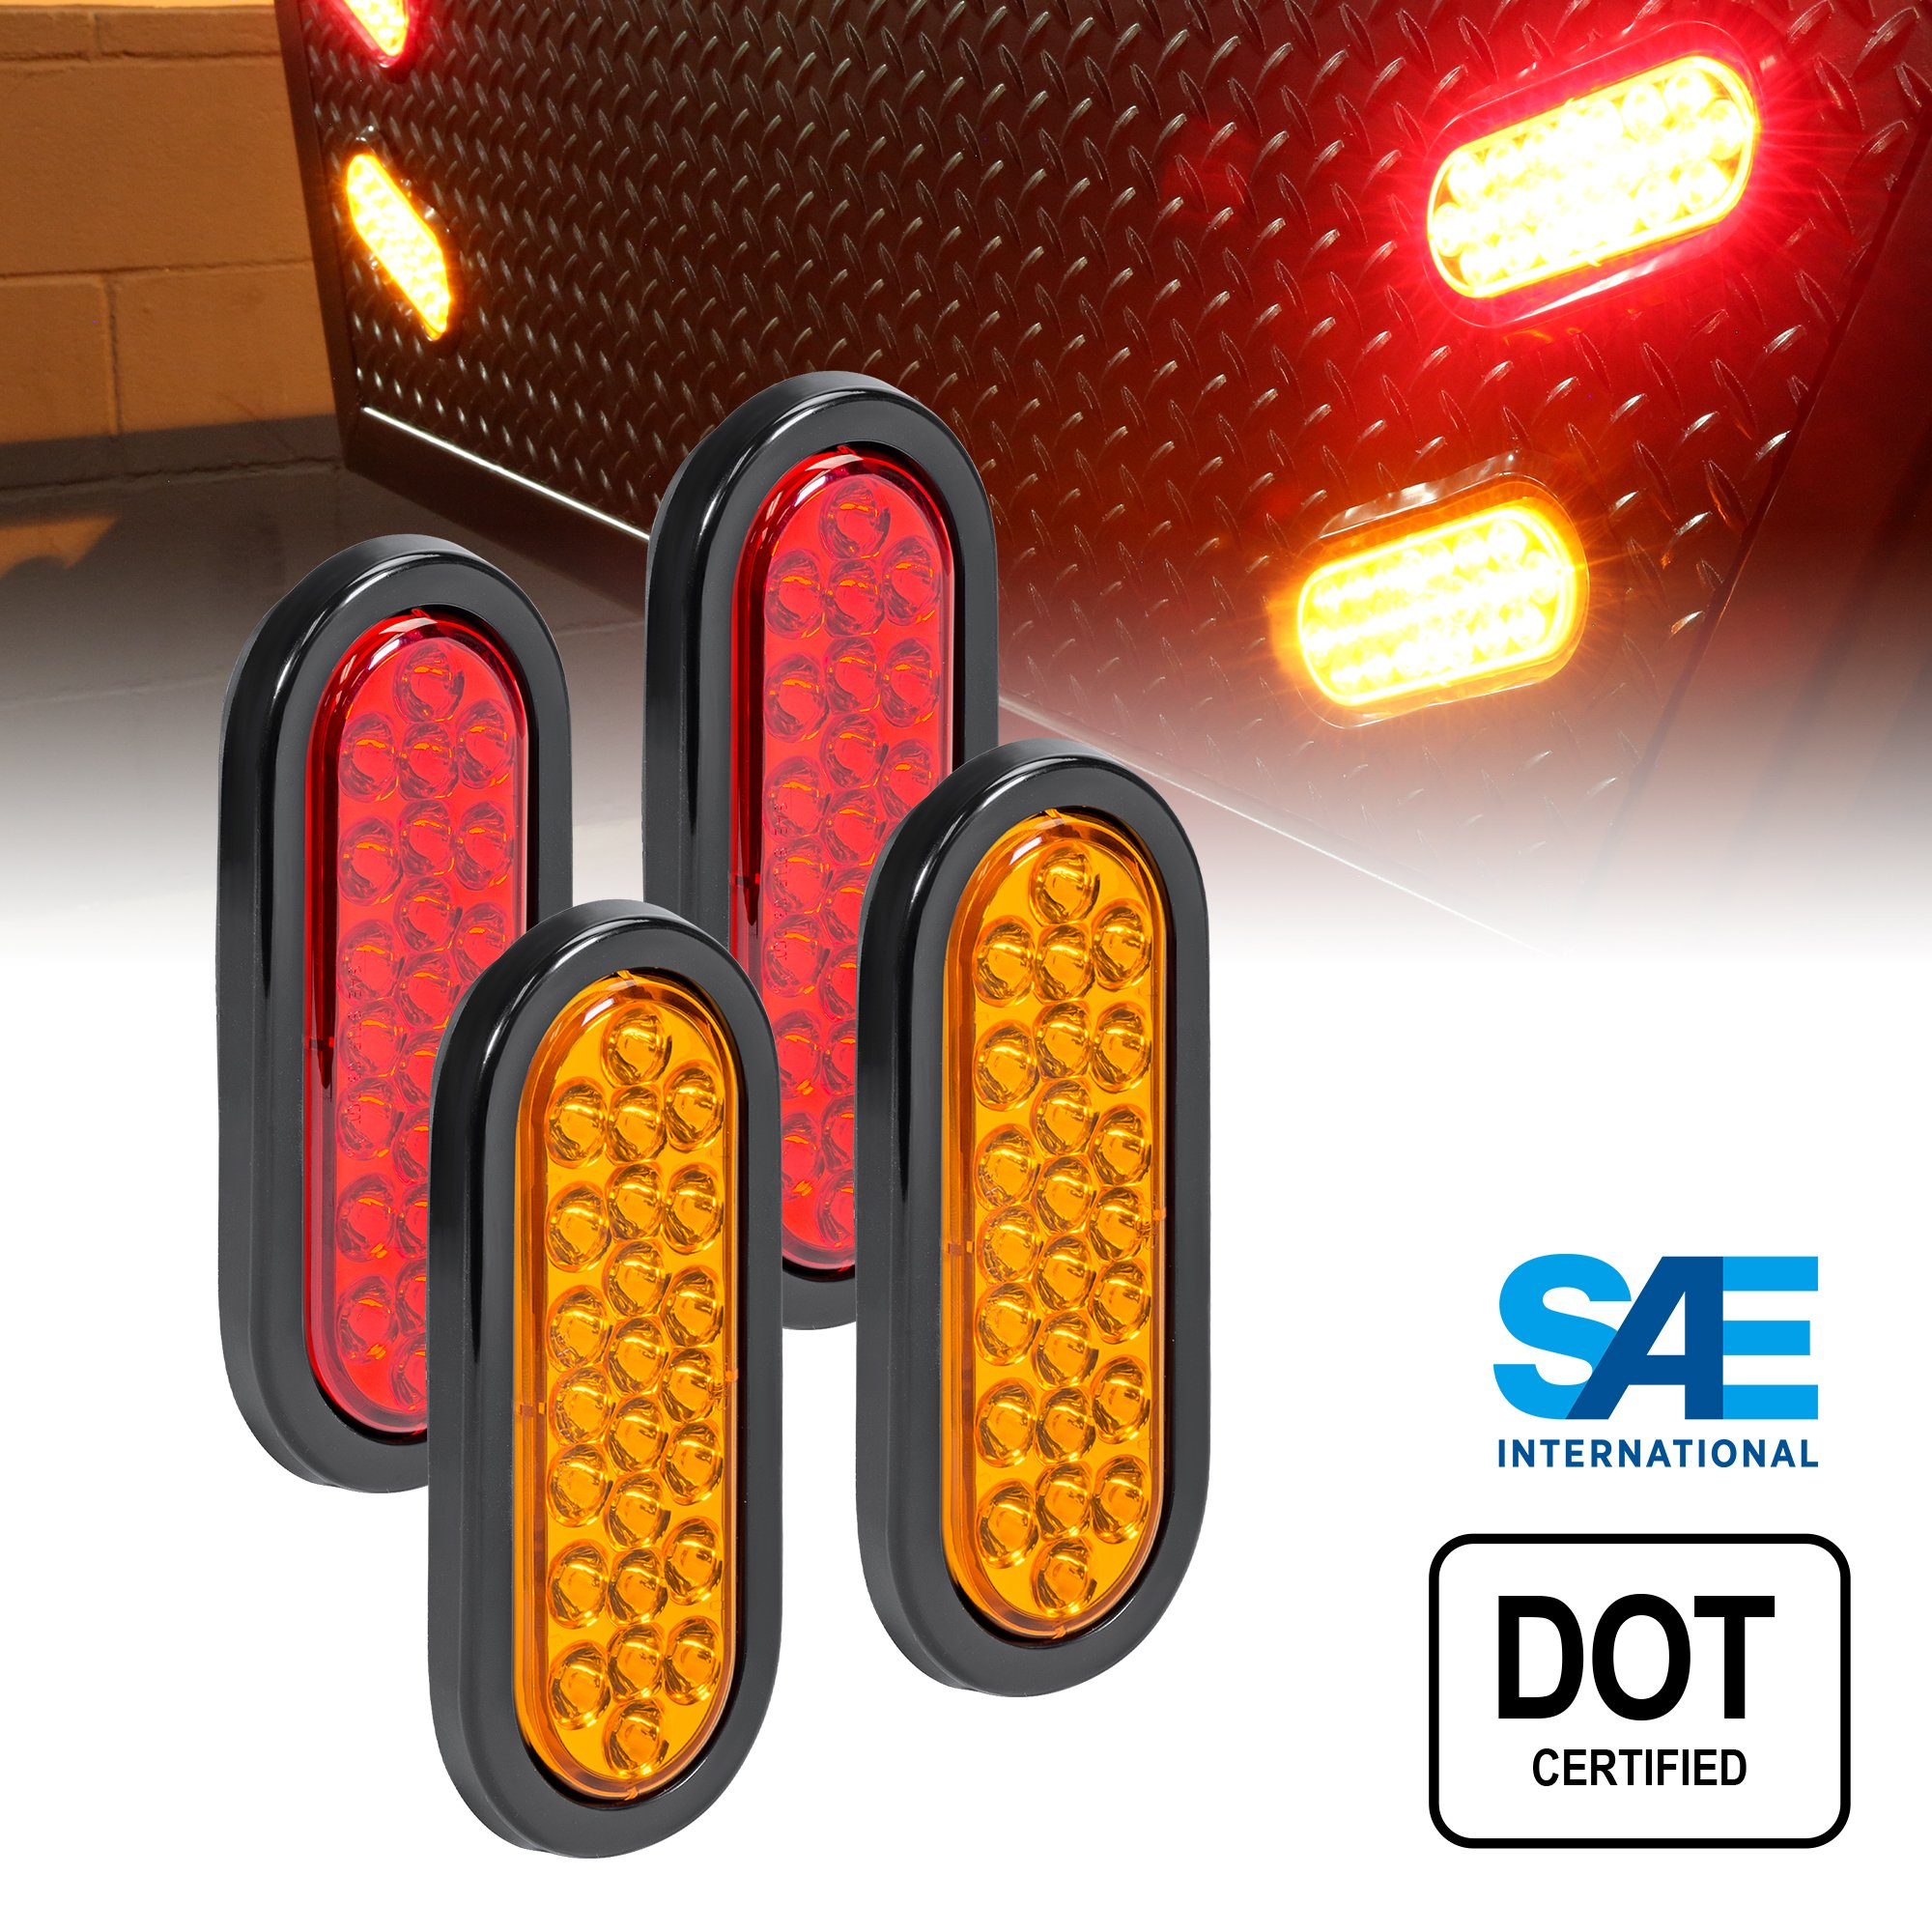 2 AMBER + 2 RED 6'' Oval (24) LED Trailer Tail Light Kit - DOT Certified STOP TURN BRAKE Tail Light